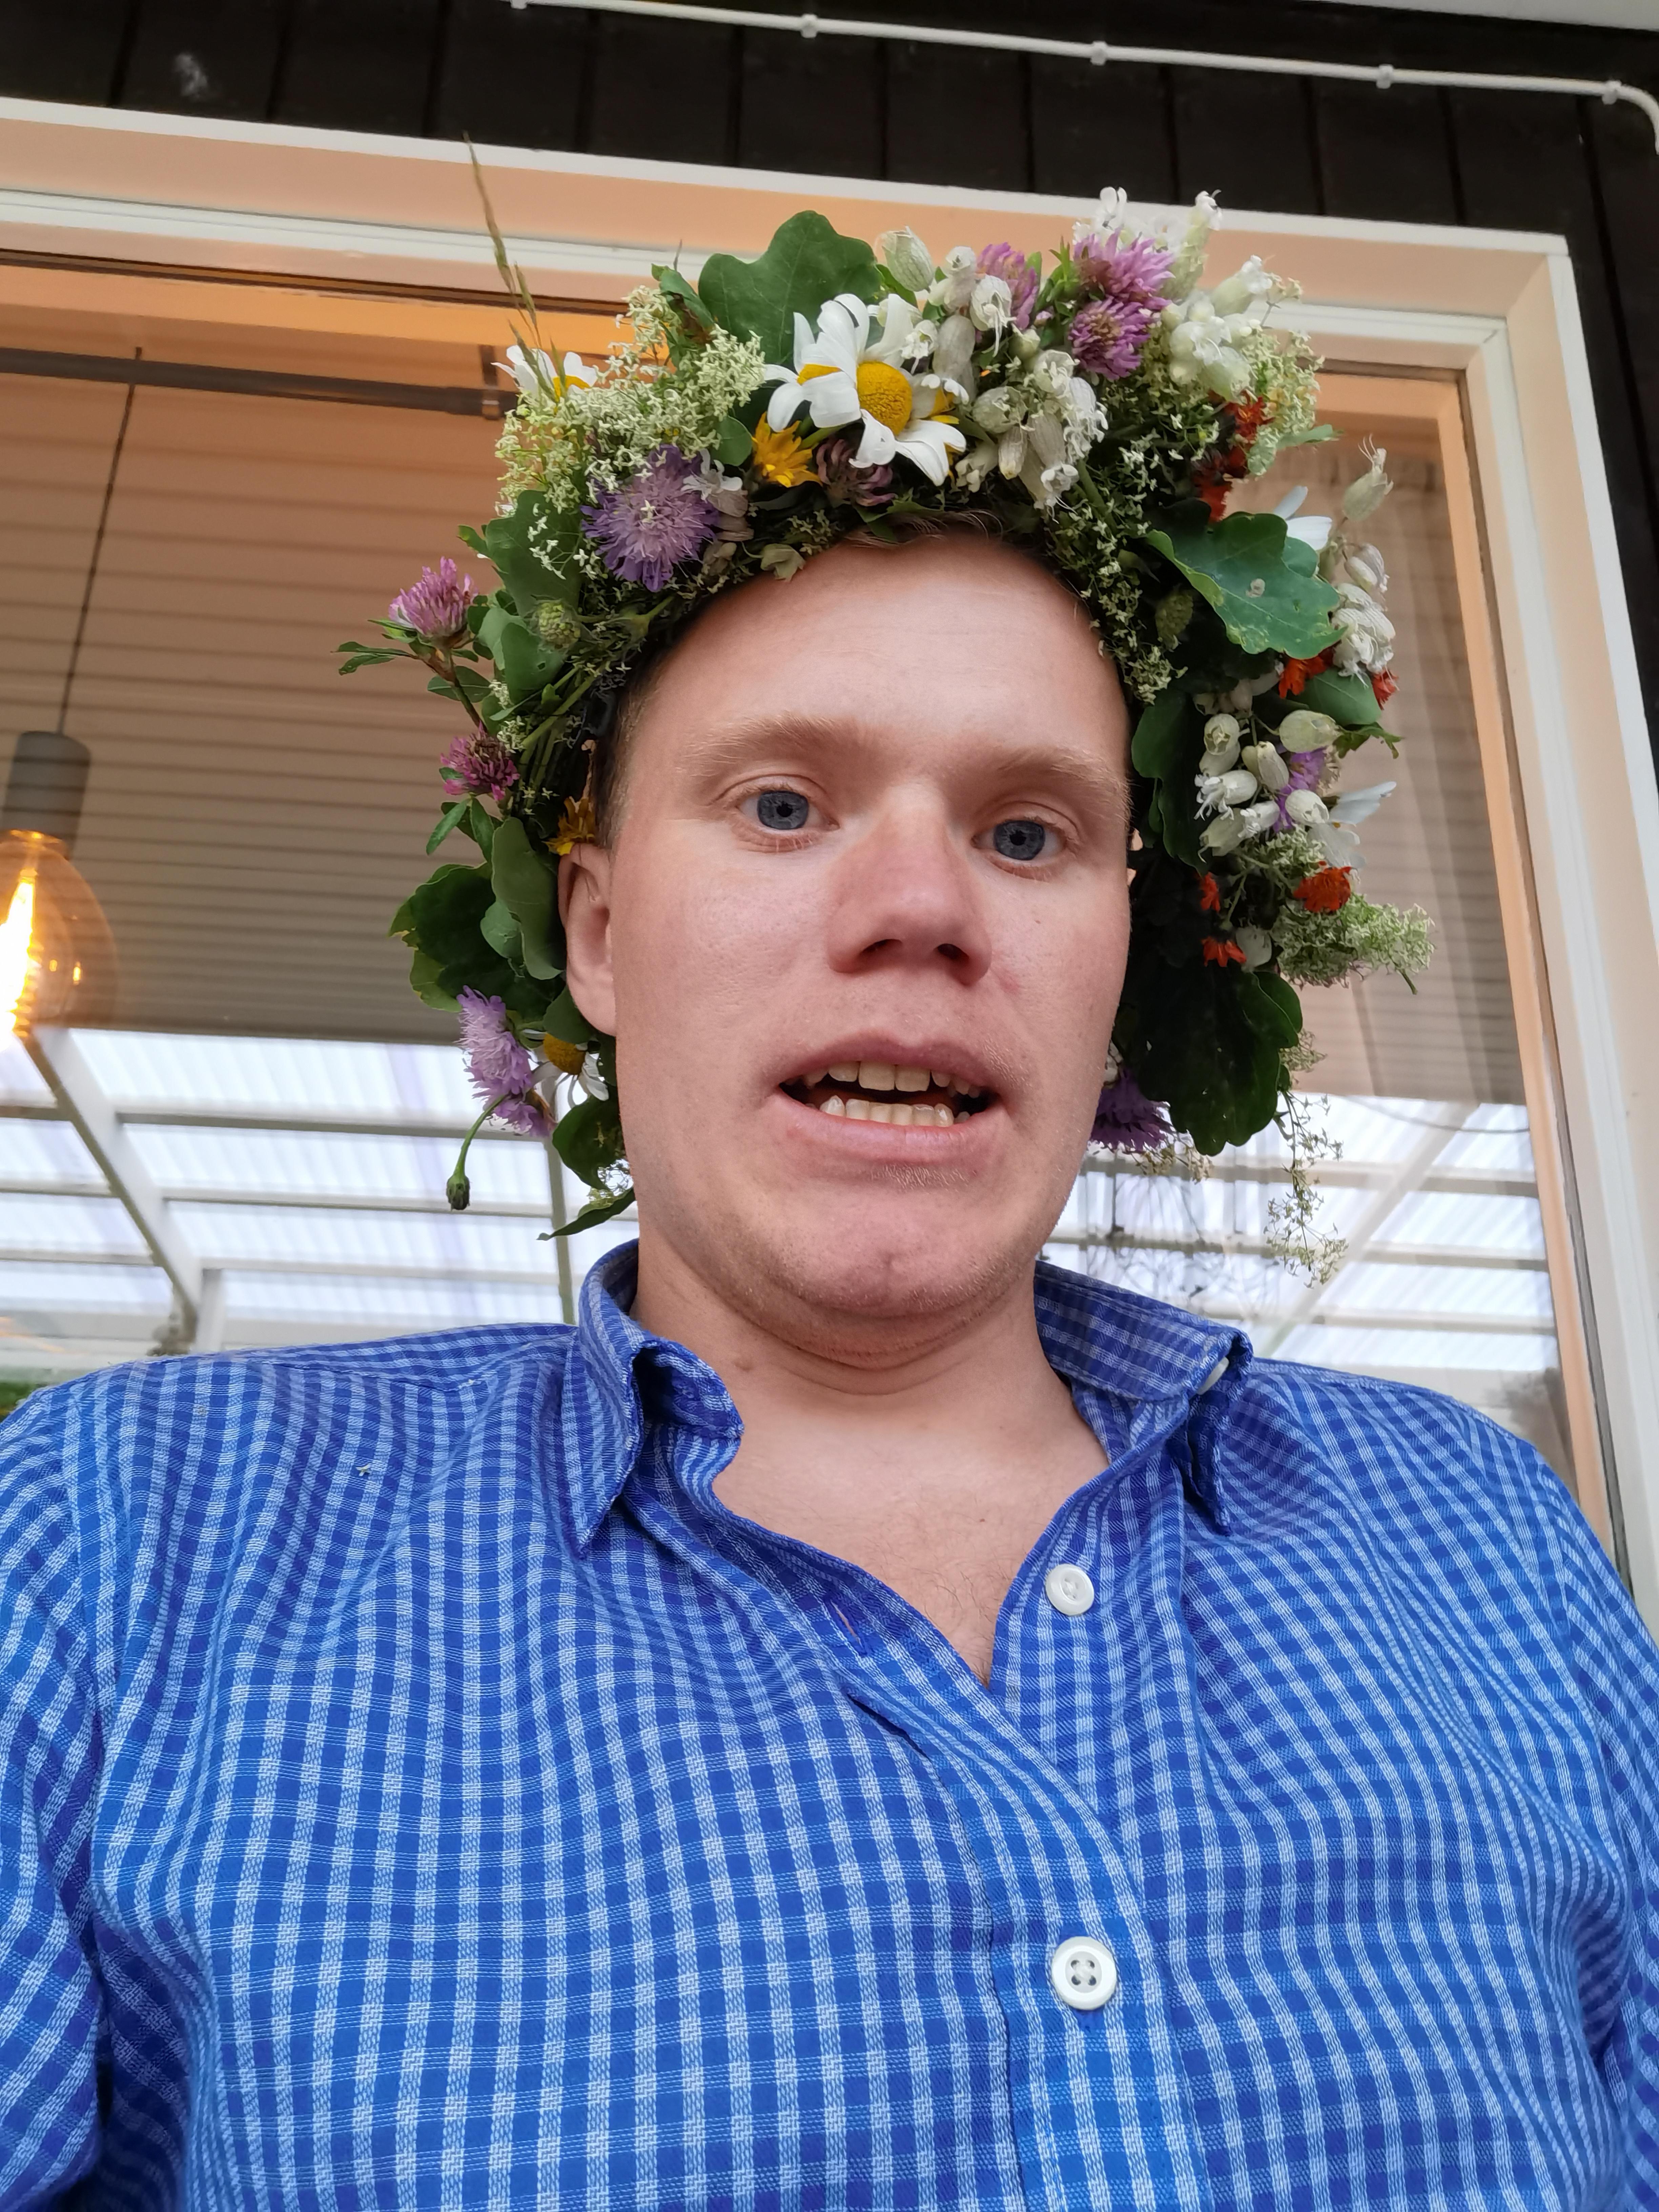 Filip_mellberg@hotmail.com's picture